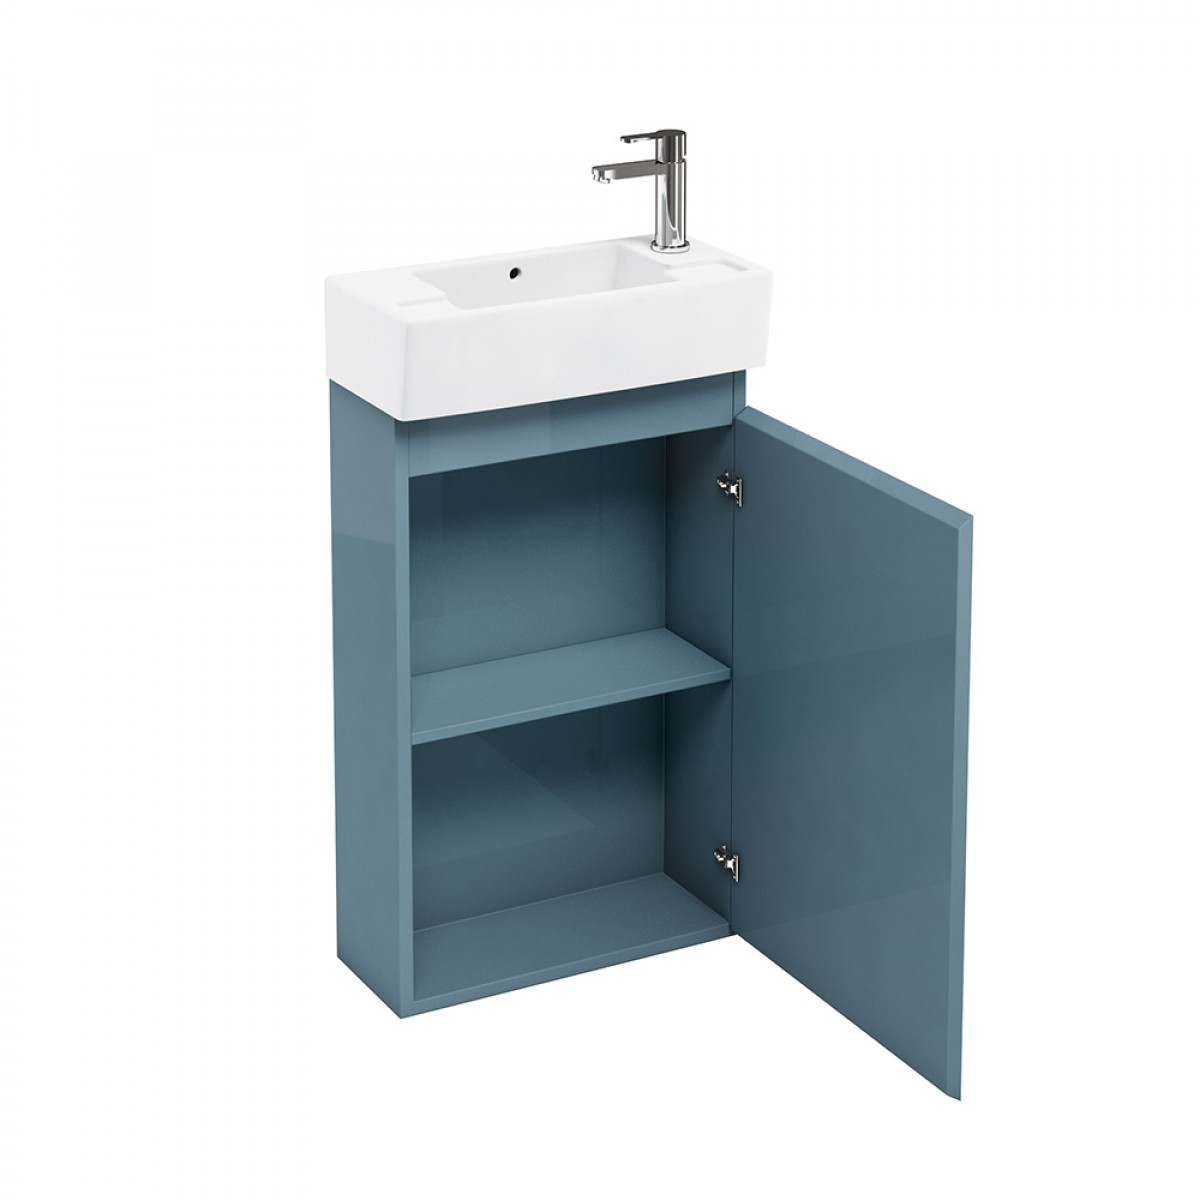 britton bathrooms compact 25cm depth floor mounted cloakroom vanity unit YPLKGFA